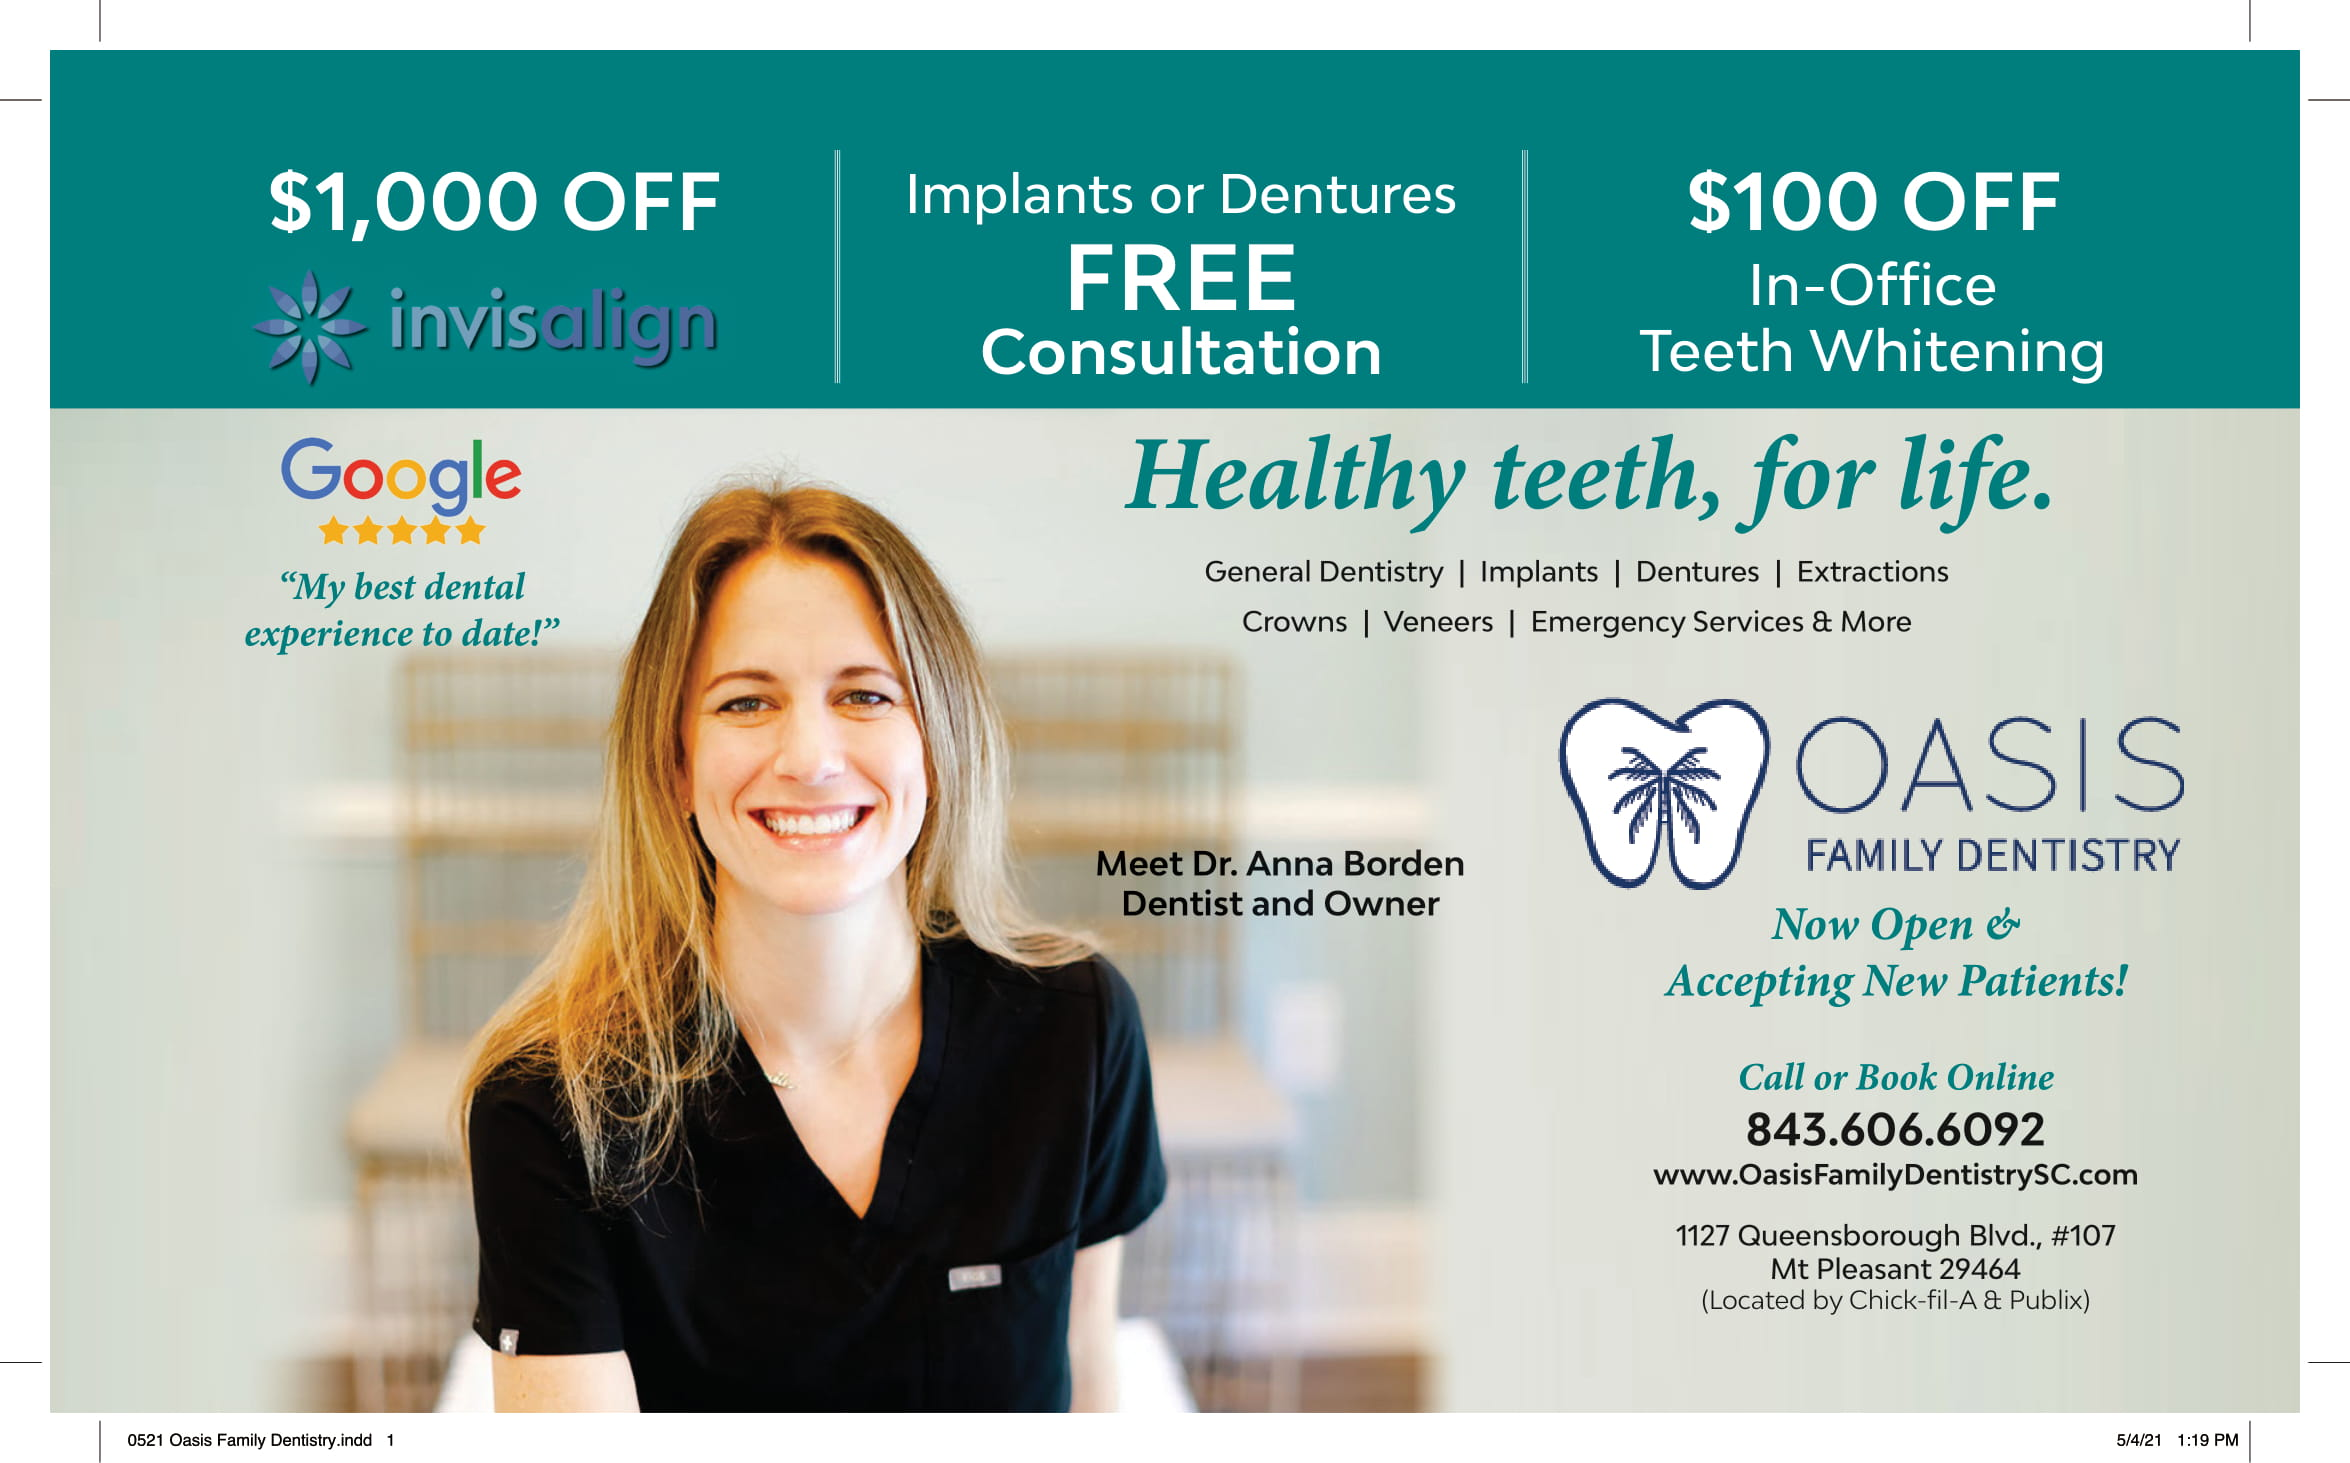 0521 Oasis Family Dentistry 1